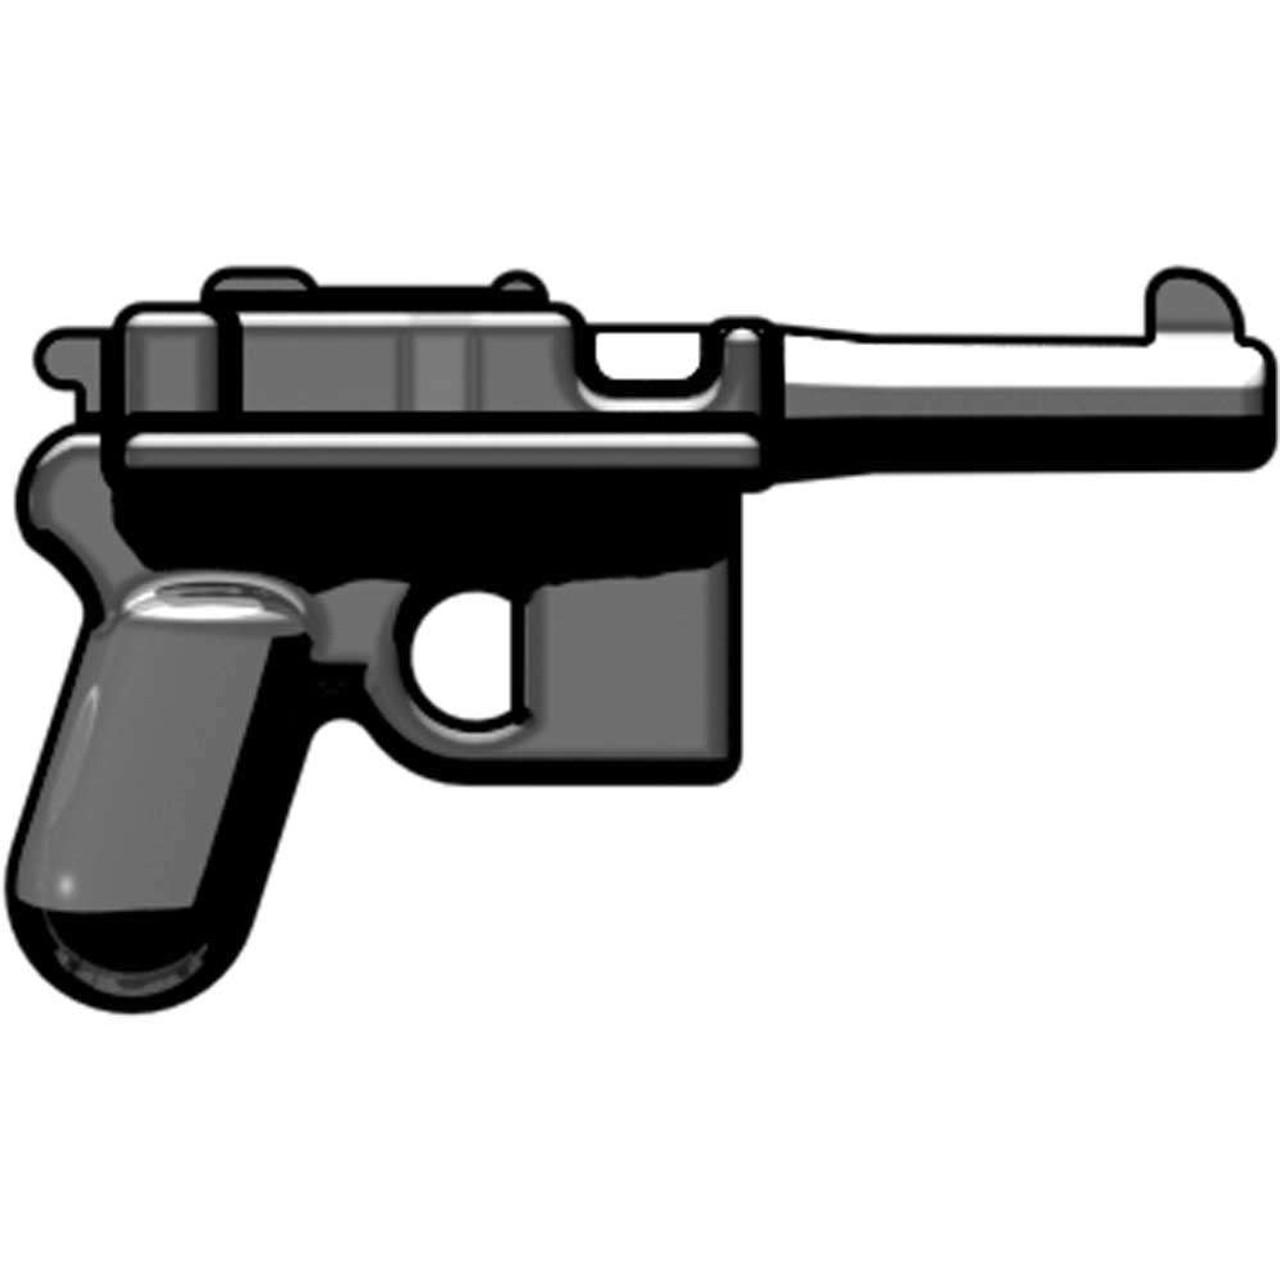 BrickArms Weapons C96 'Broomhandle' Mauser 2.5-Inch [Gunmetal]